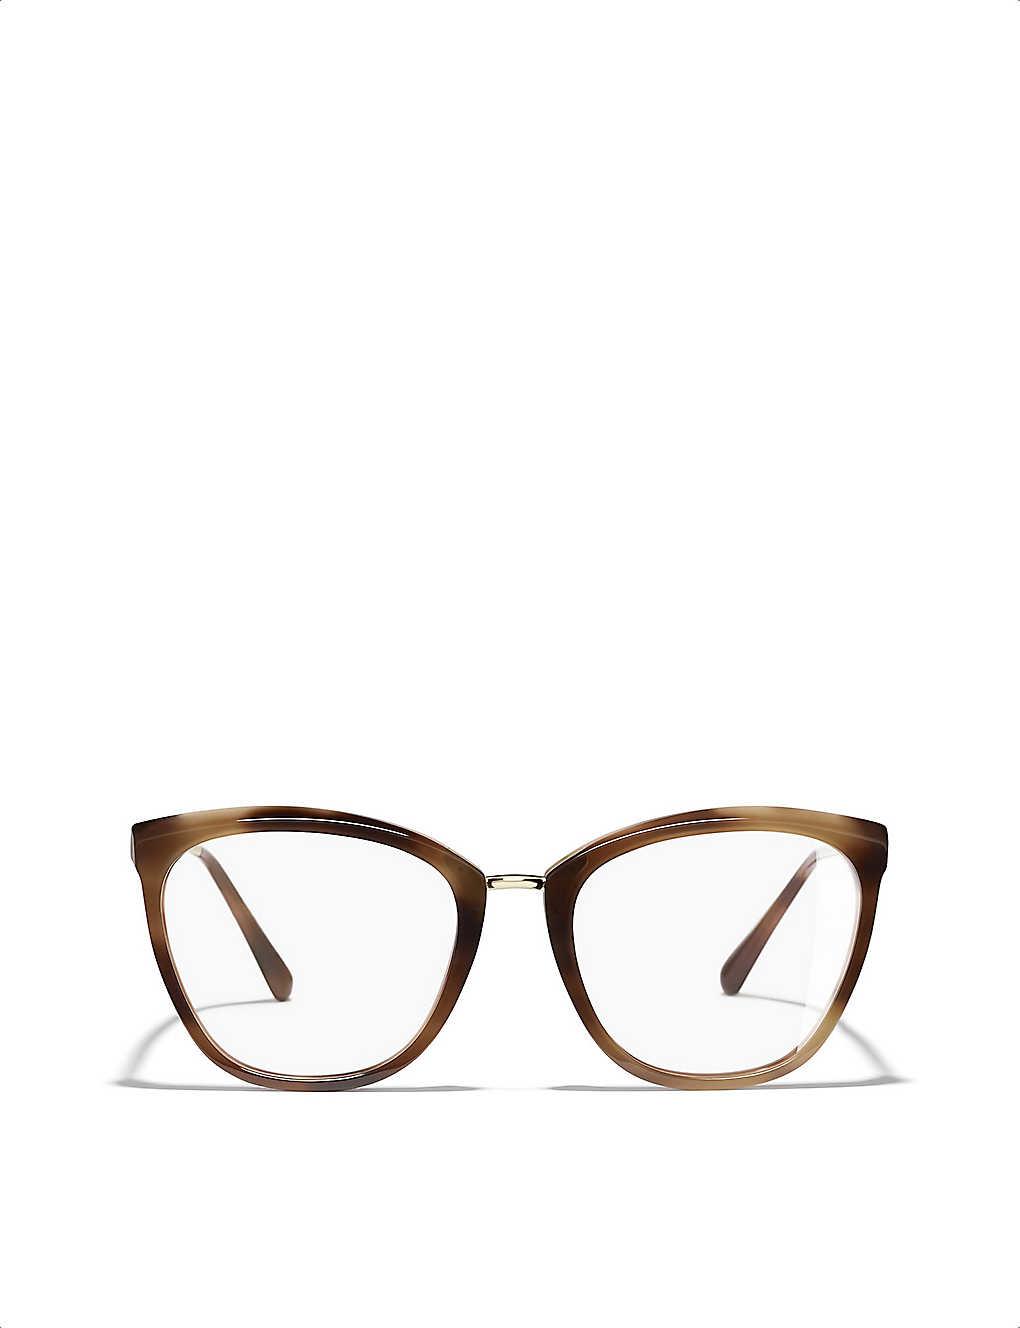 9403ce3c6a6 CHANEL - Havana 3381 cat eye glasses frames